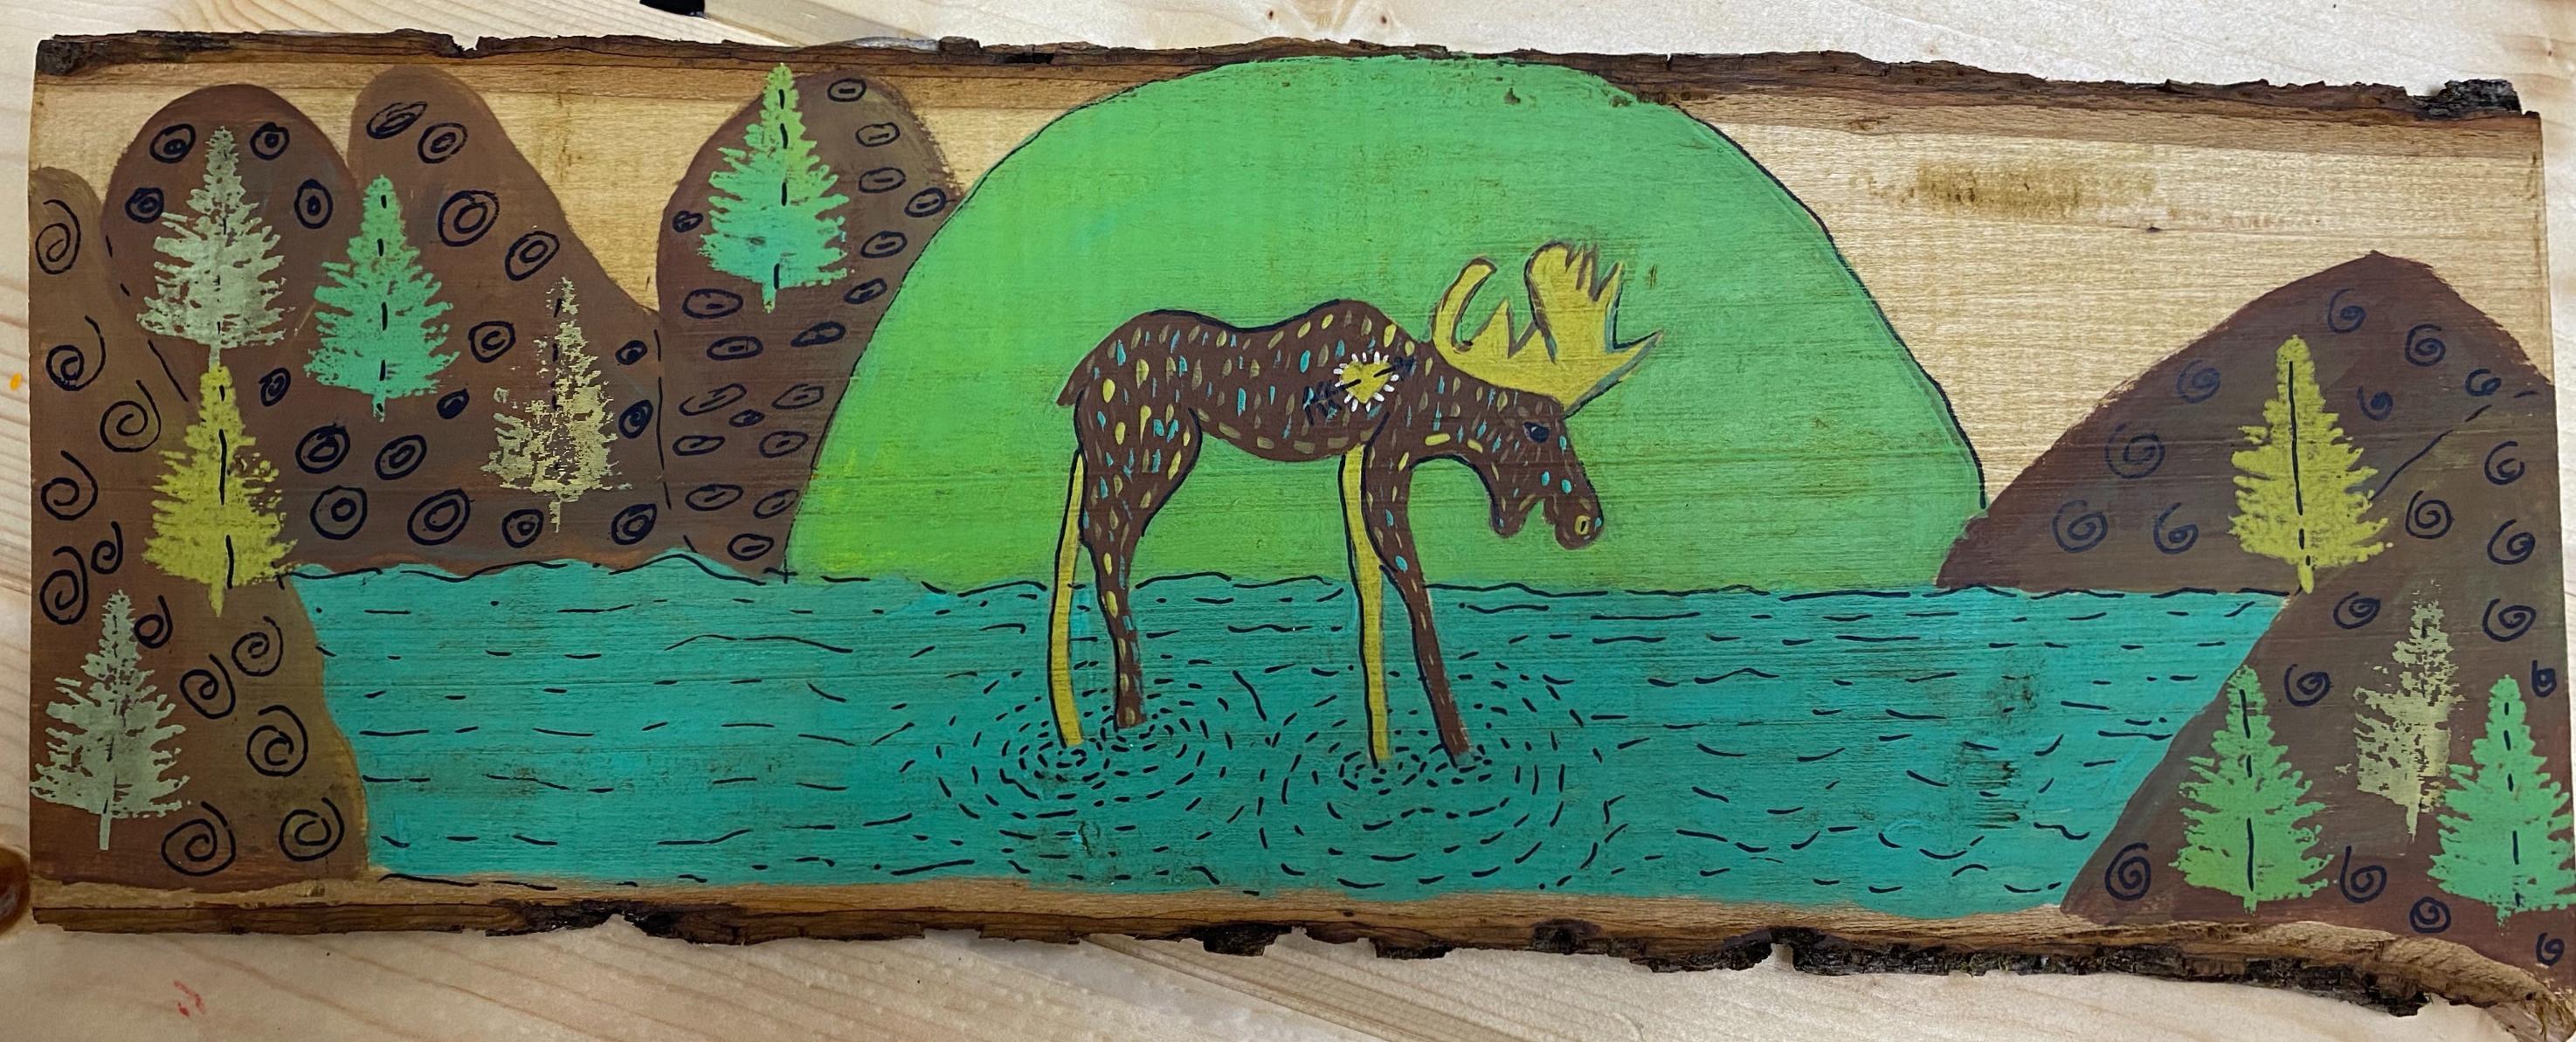 Woodland Creatures Moose 10/02 @ 11:22am